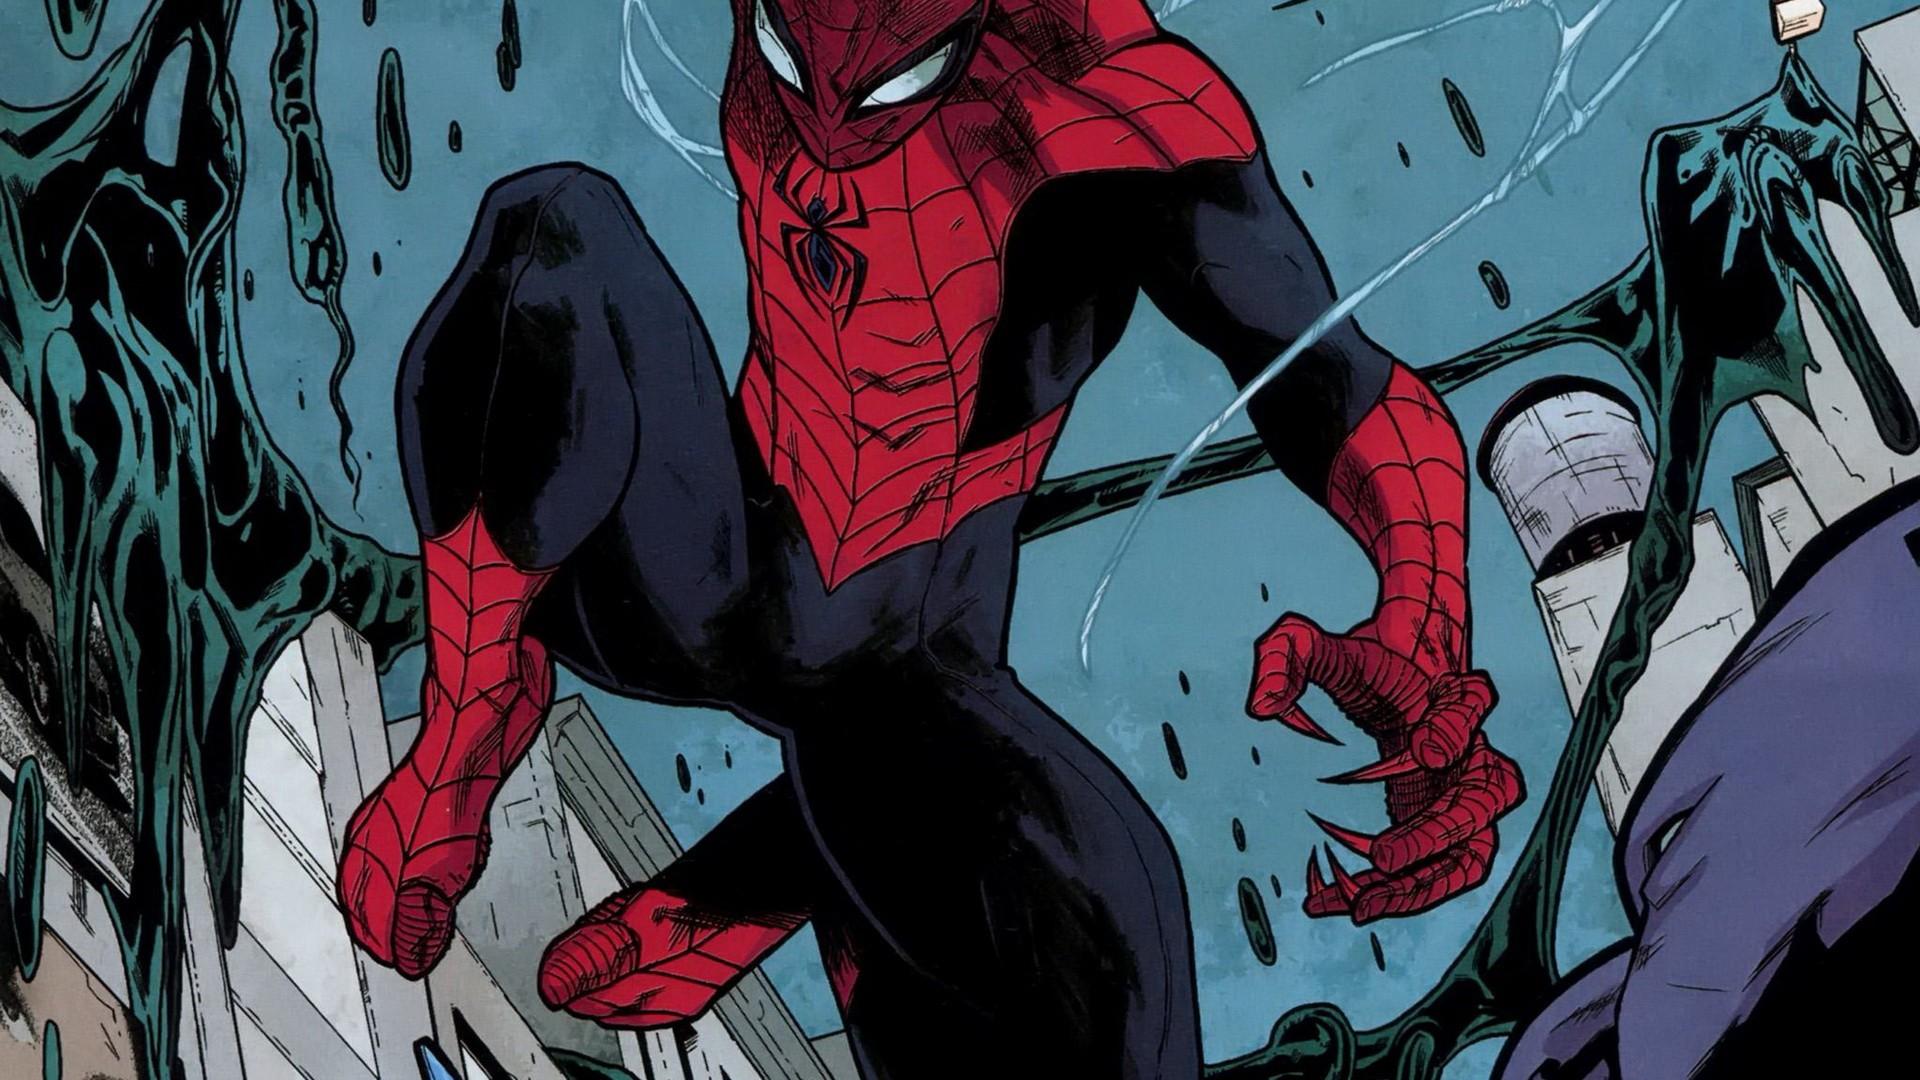 Spider man comic wallpaper - photo#17